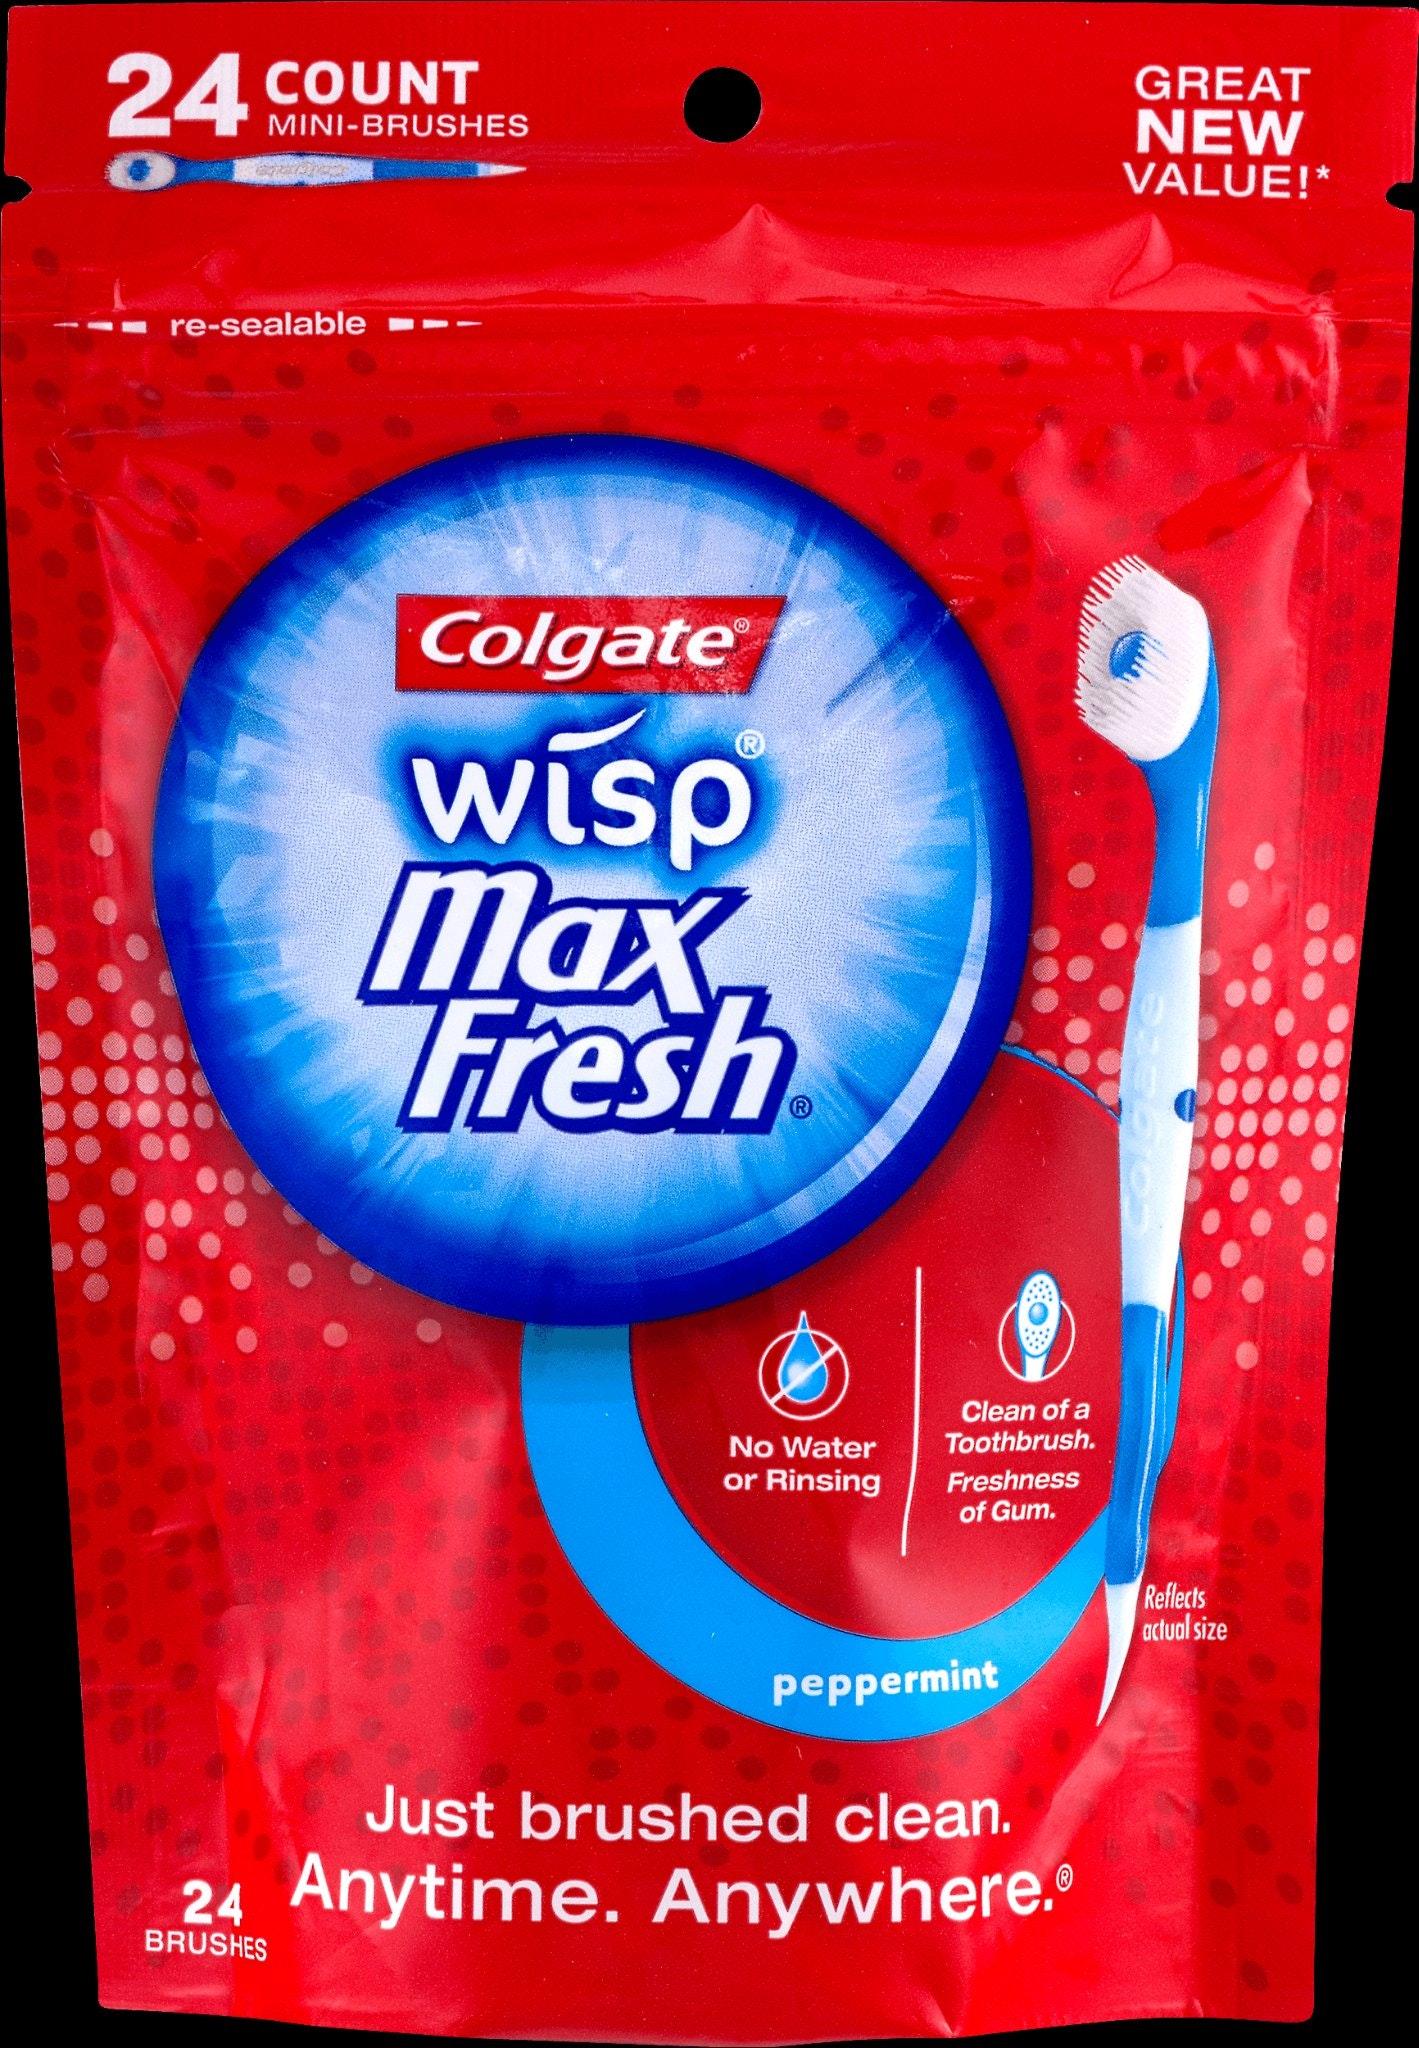 Colgate Wisp Portable Peppermint Flavor Mini-Brush